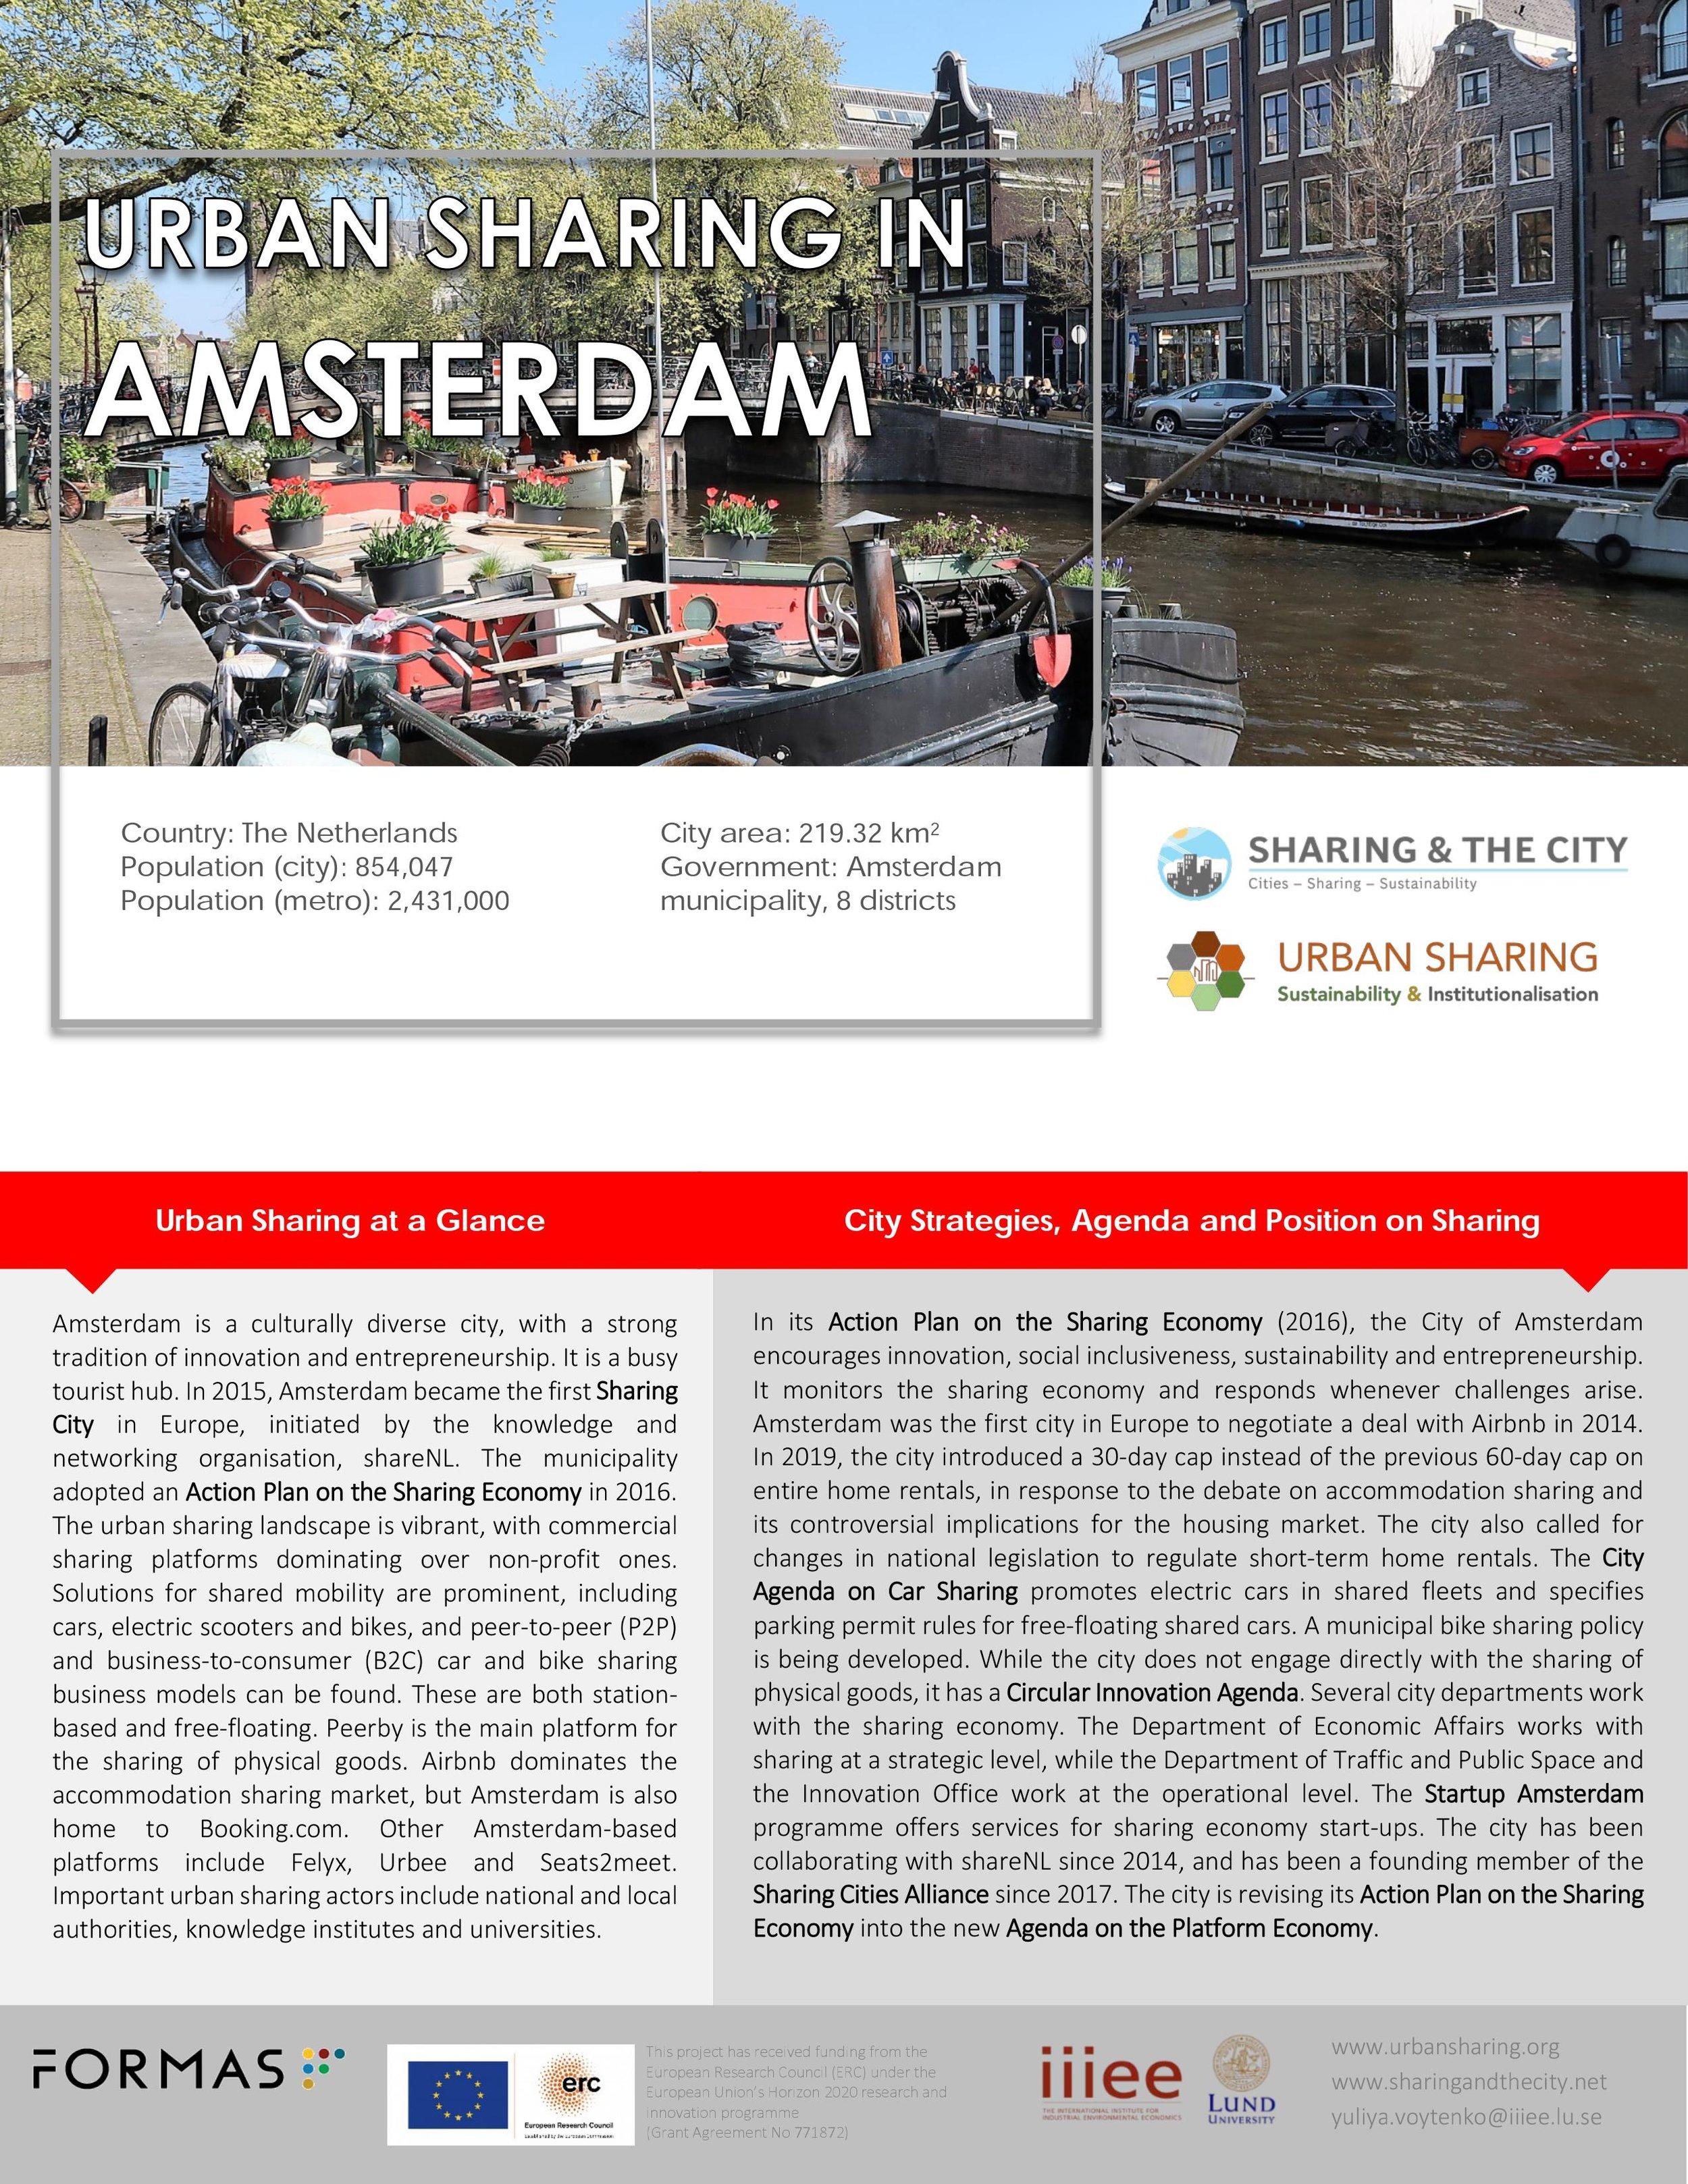 Amsterdamsnapshot1.jpg